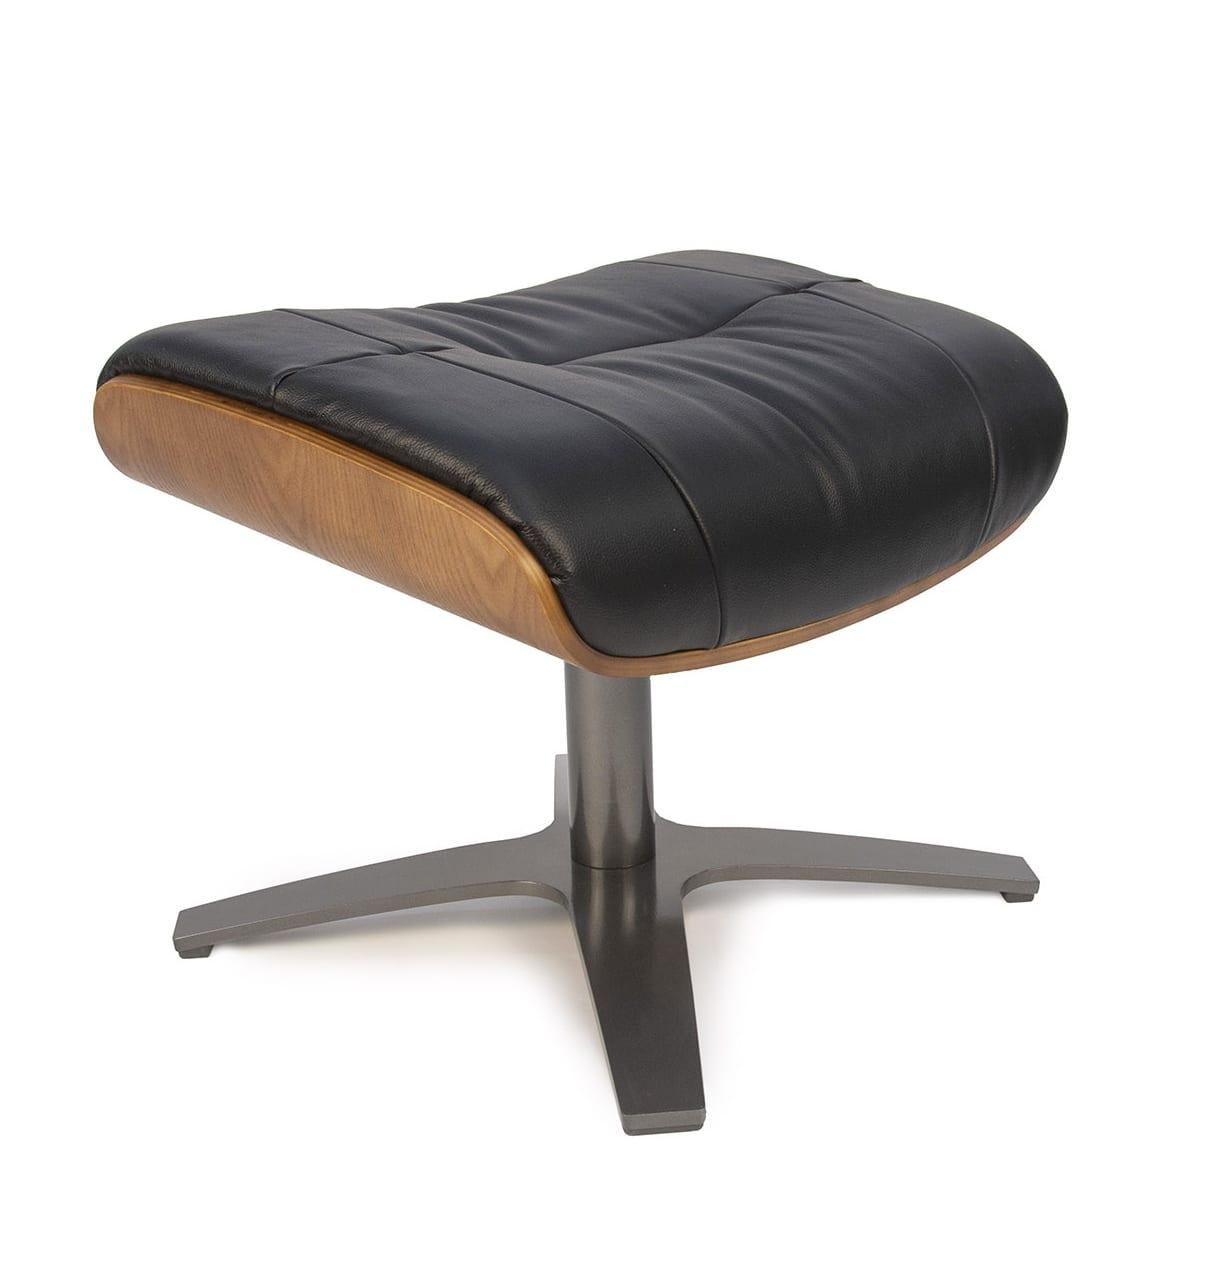 Repose-pieds de relaxation cuir noir et chêne naturel